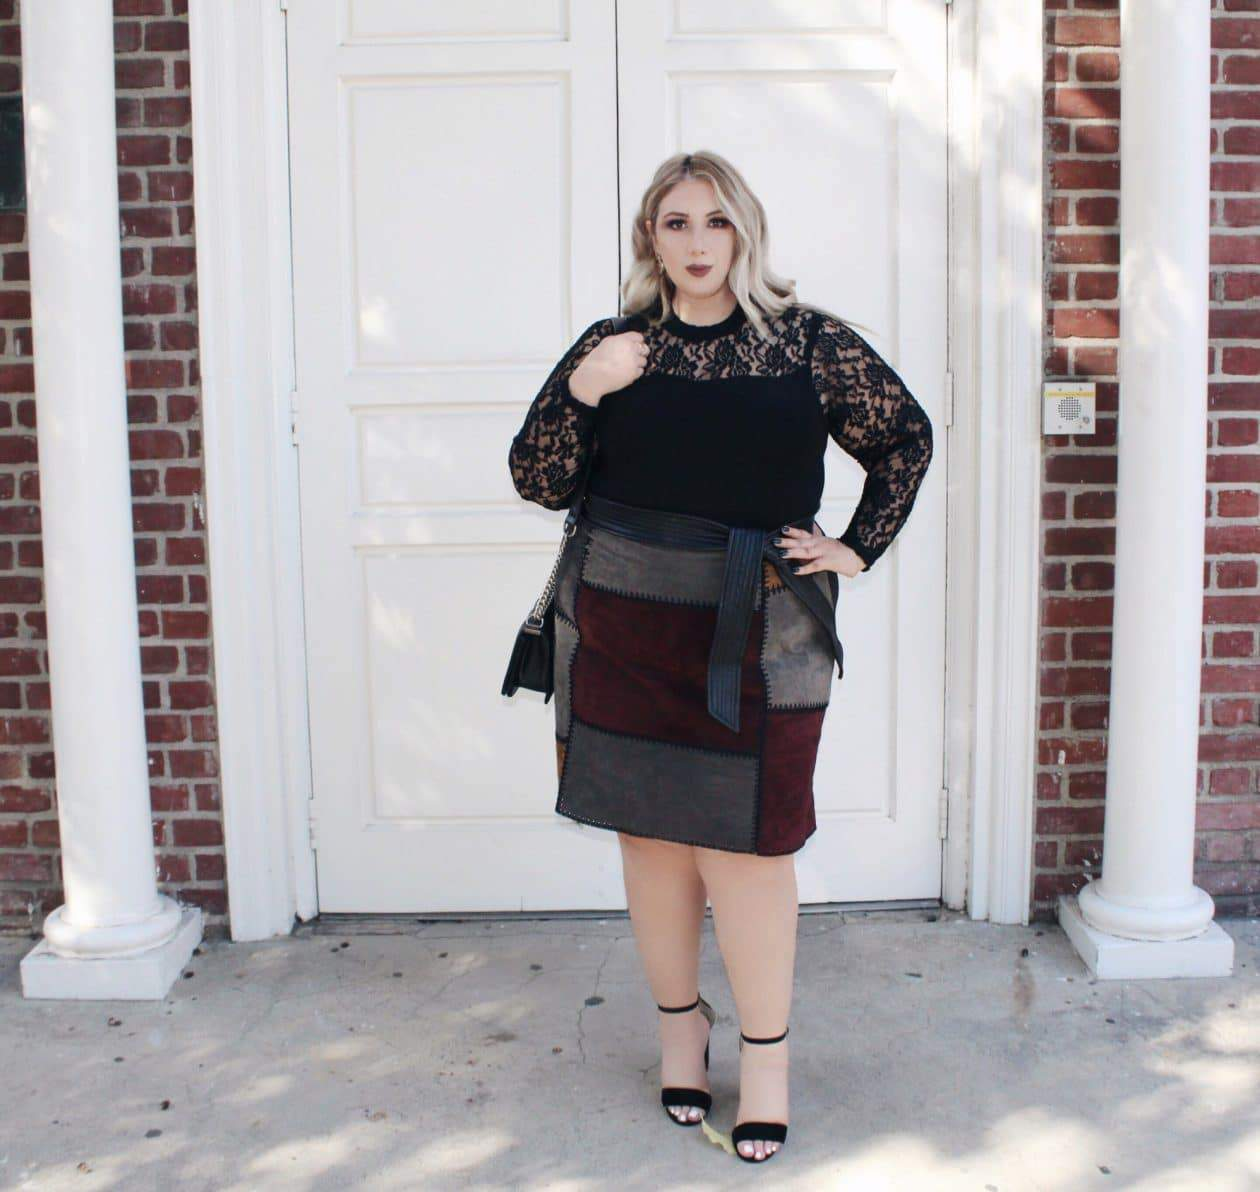 Plus Size Fashion Blogger Spotlight: Blair of Note Blair